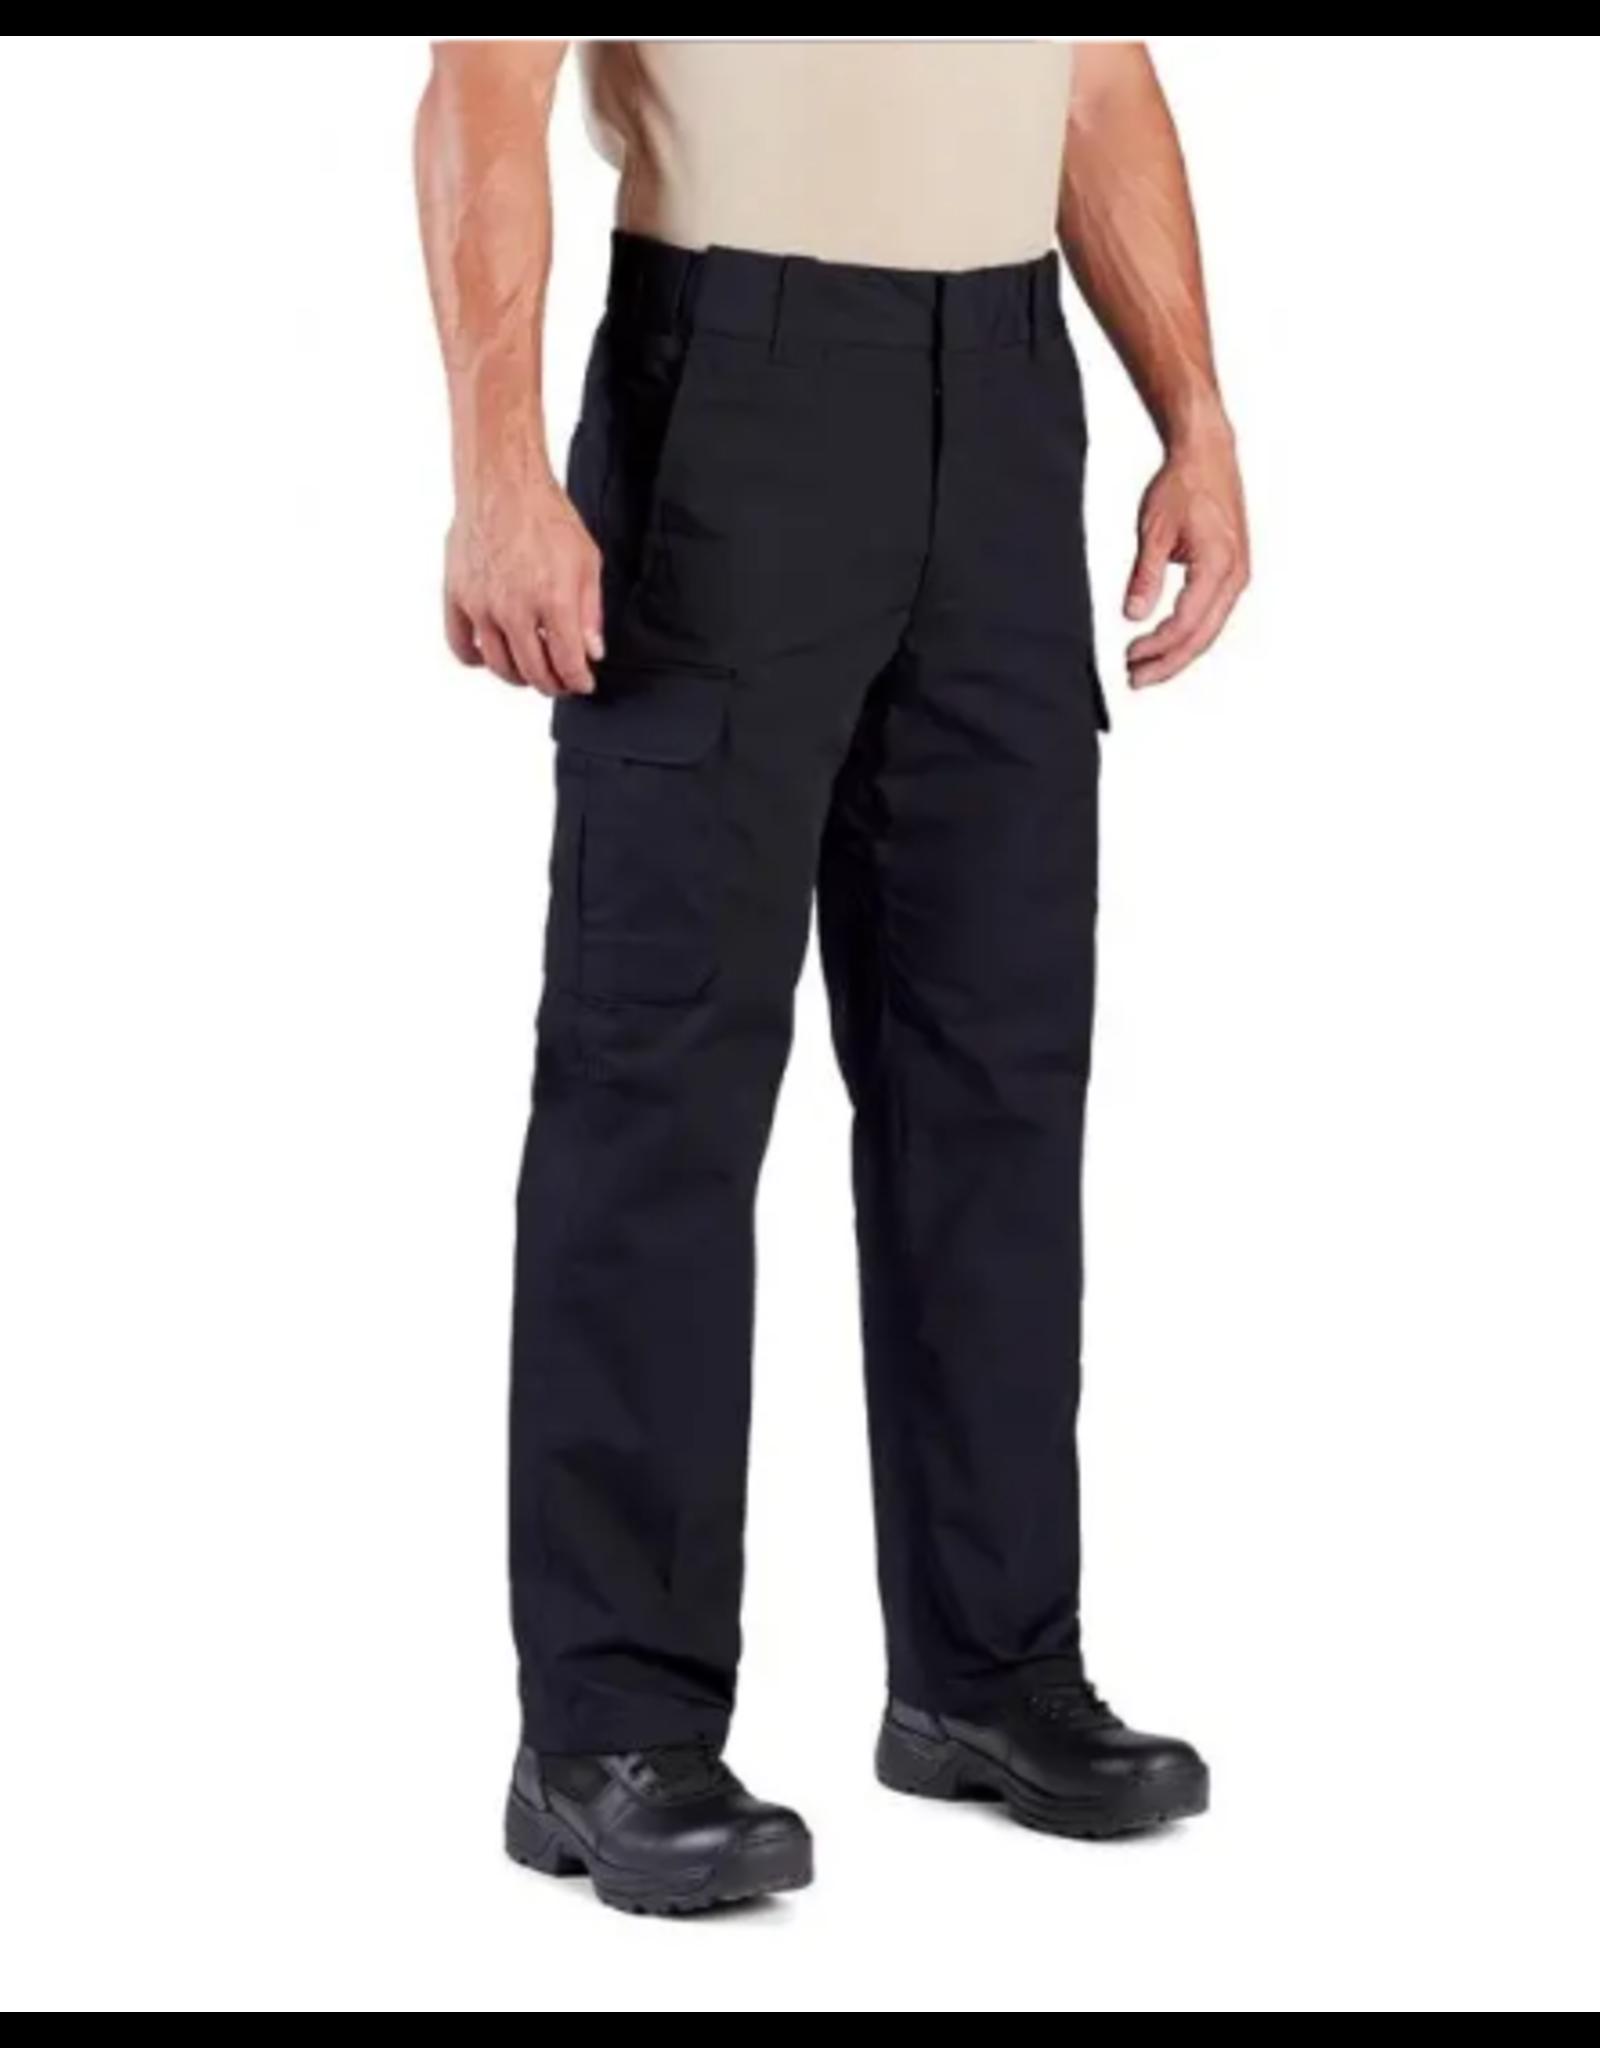 Propper Propper Men's Duty Cargo Pant 34x36 Midnight Navy